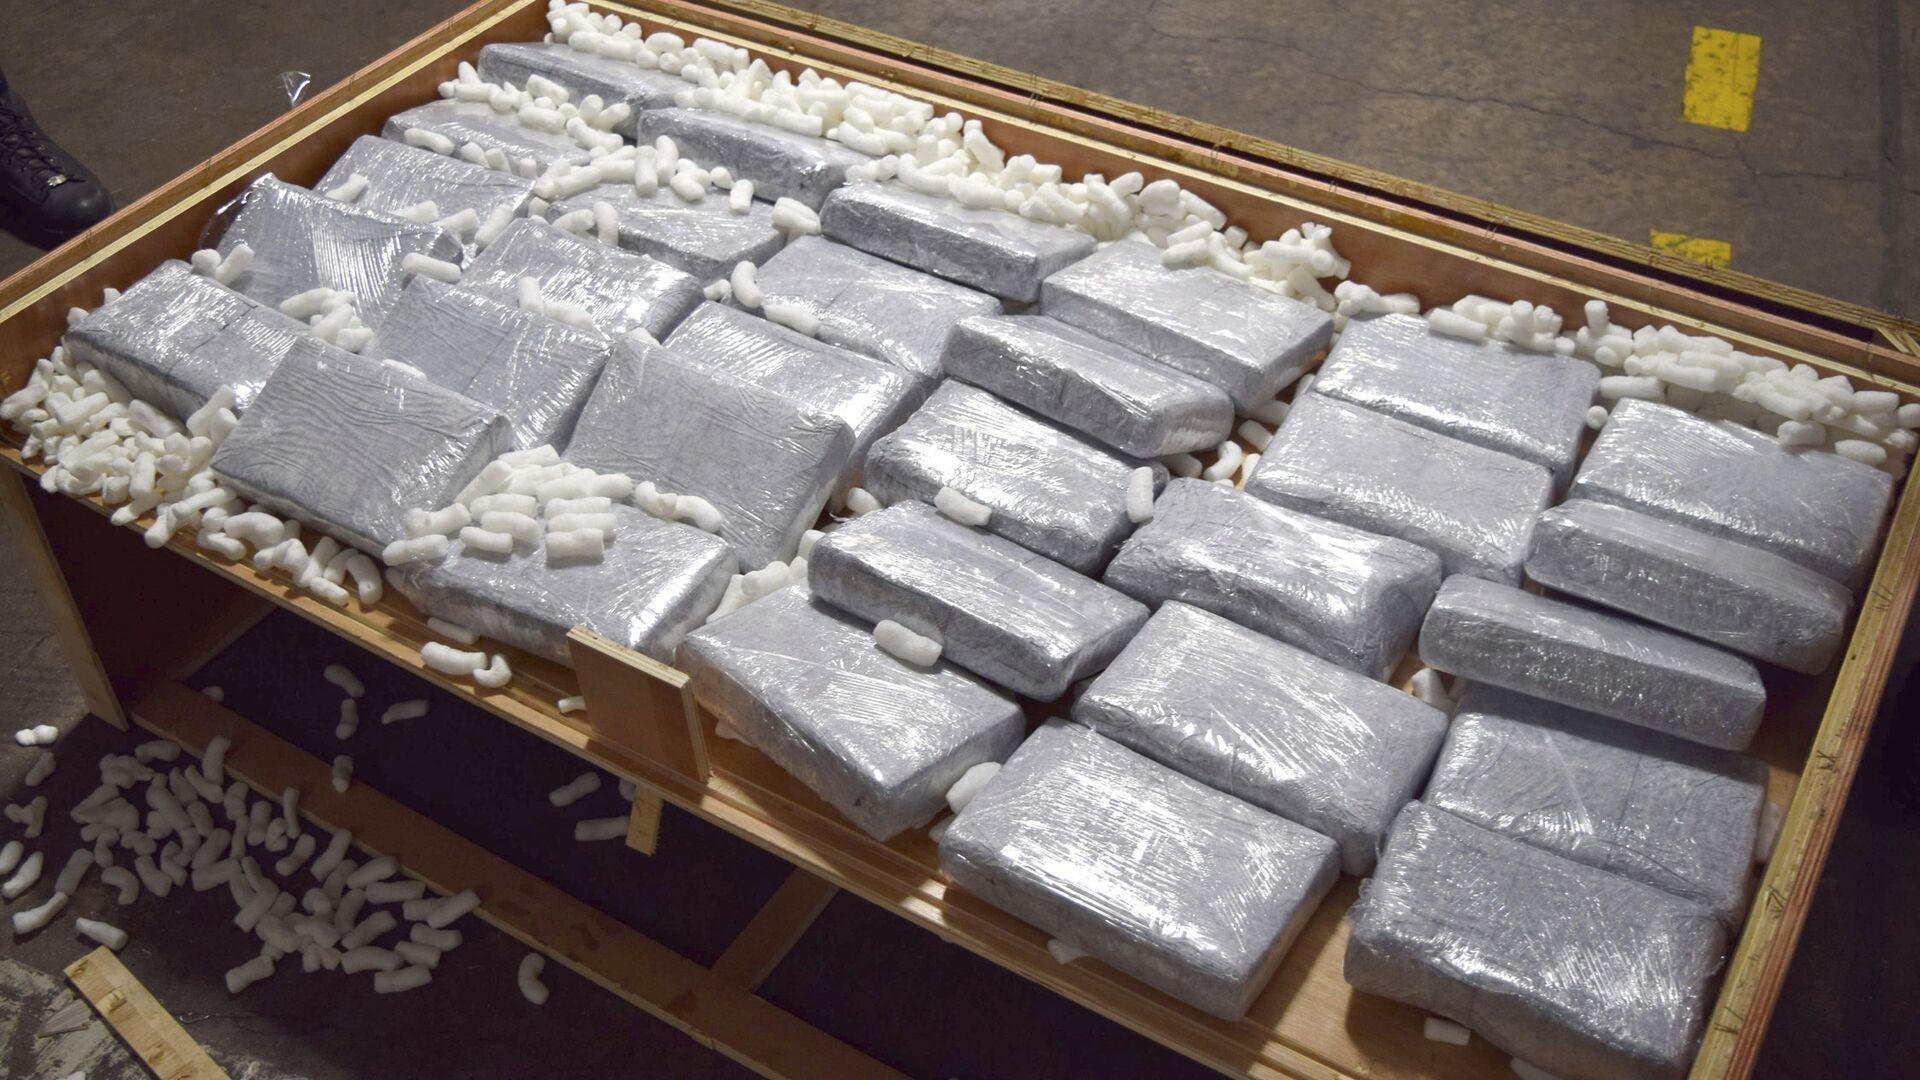 Un cargamento de drogas (archivo) - Sputnik Mundo, 1920, 16.06.2021